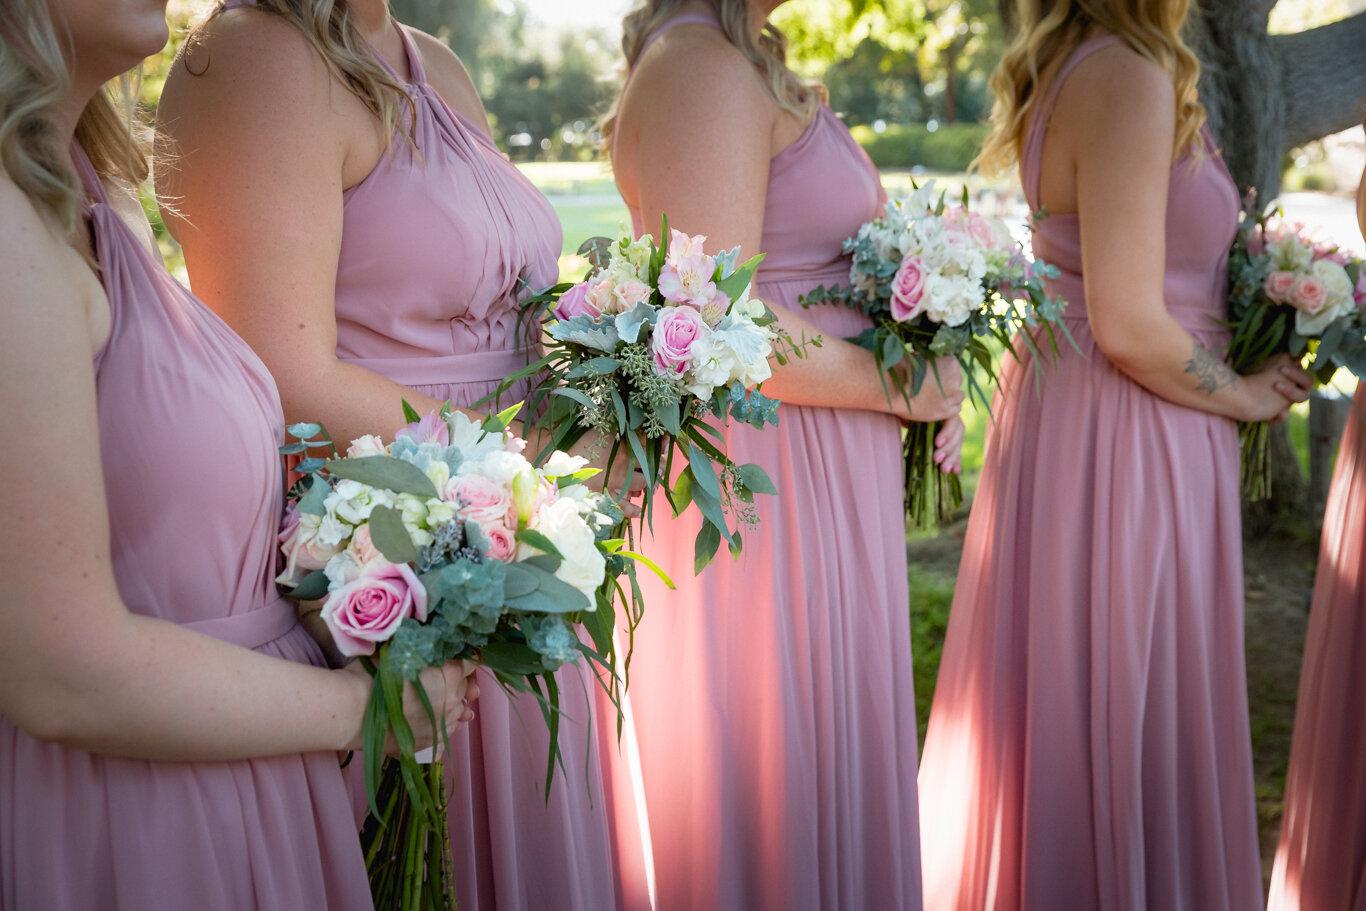 2019.08.24_Emily-Ashir-Wedding-at-the-Maples-5850.jpg